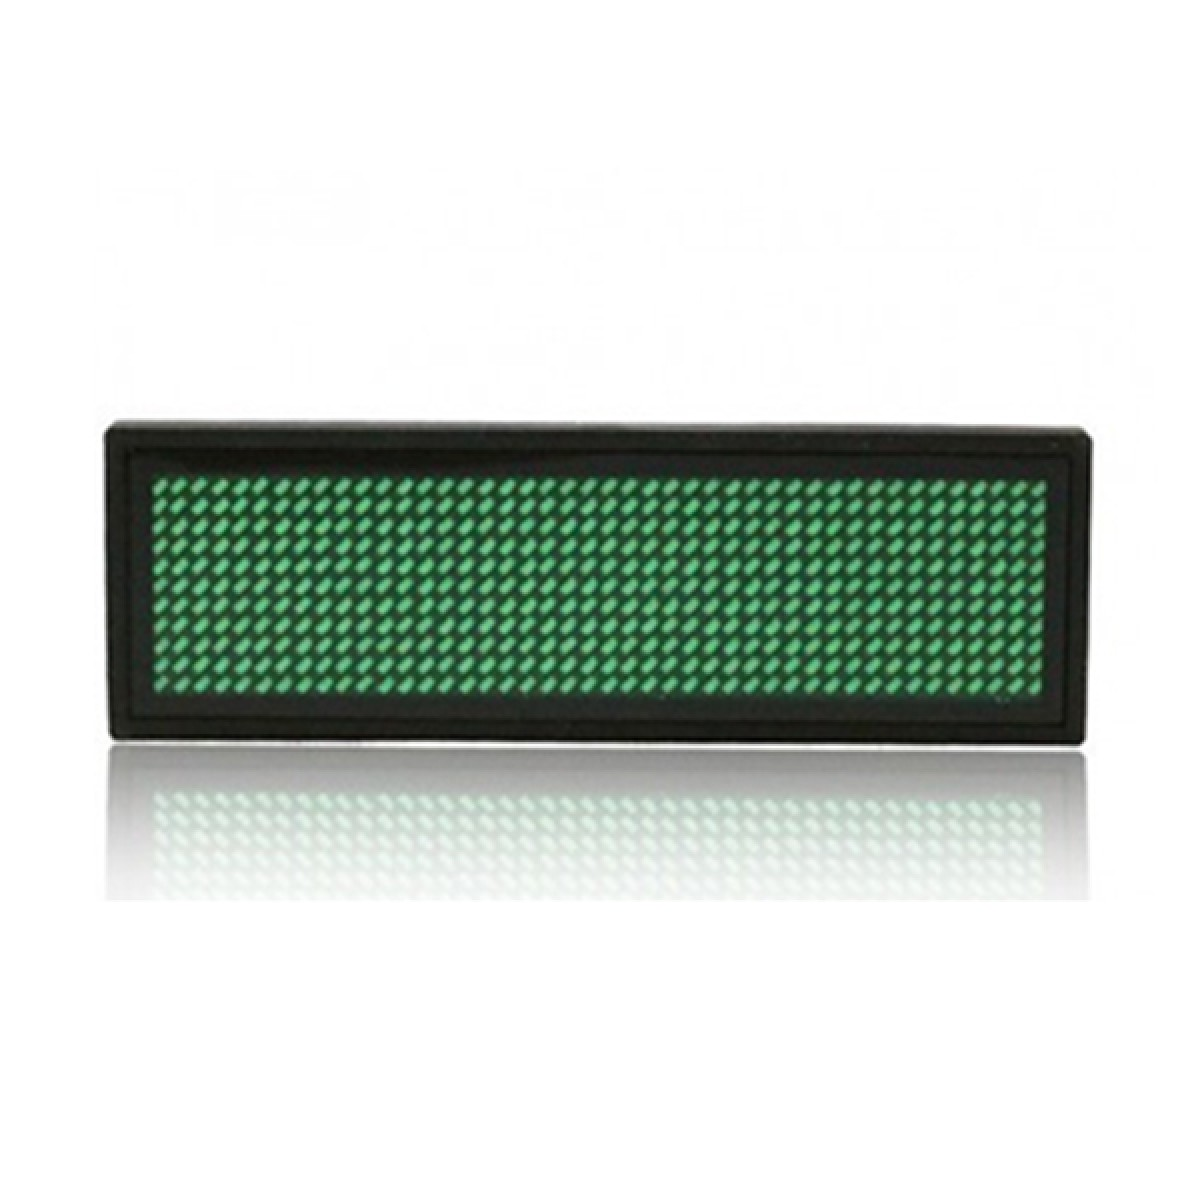 LED Ταμπελάκι τύπου κονκάρδα κυλιόμενων μηνυμάτων πράσινο χρώμα 8x3 cm B1236